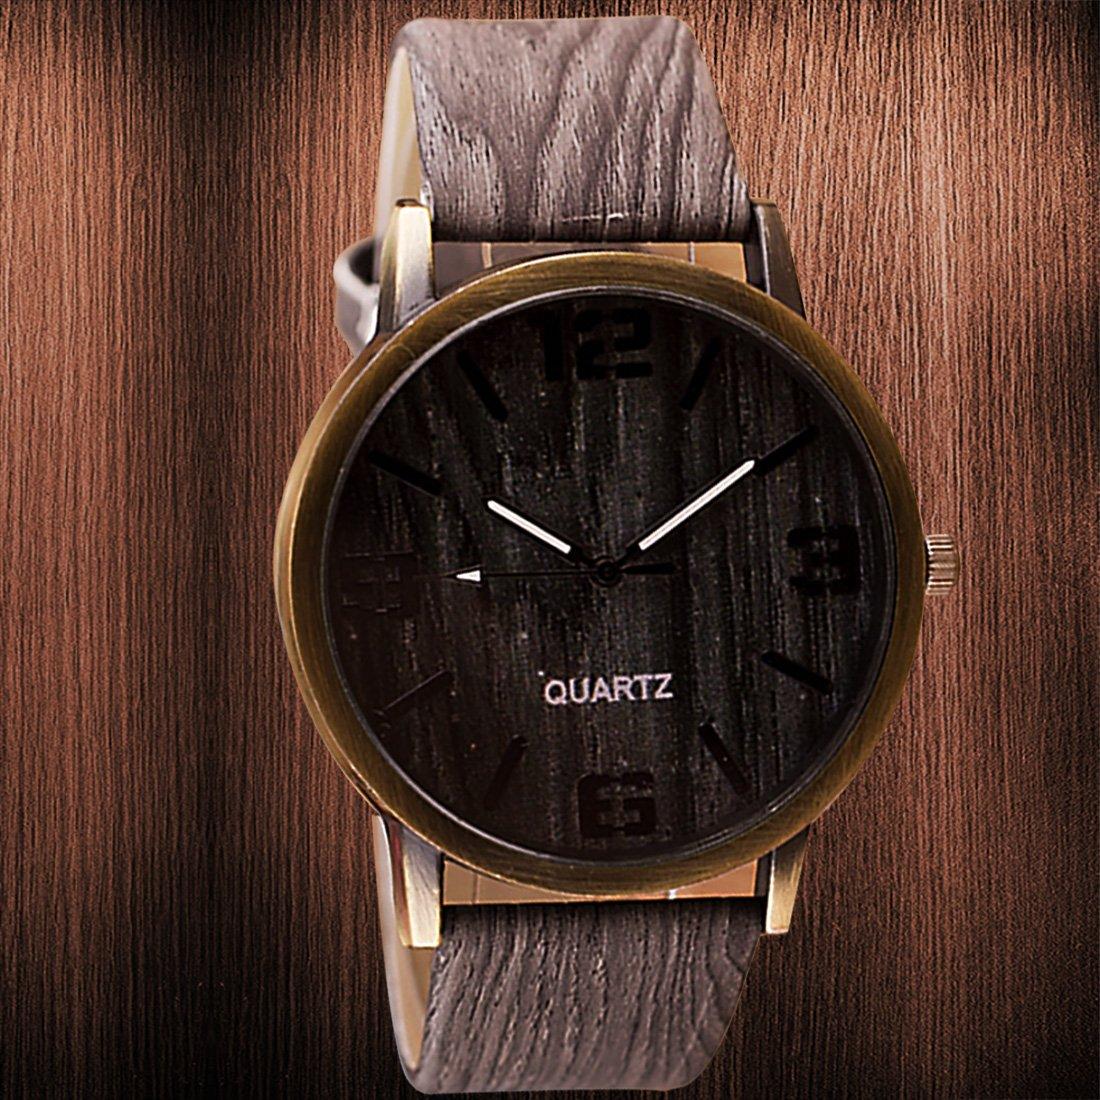 Amazon.com: 2016 Classical Wooden Watch Women Wristwatches Vintage Style Men Dress Watch Pu Leather Quartz Watch 2#: Watches